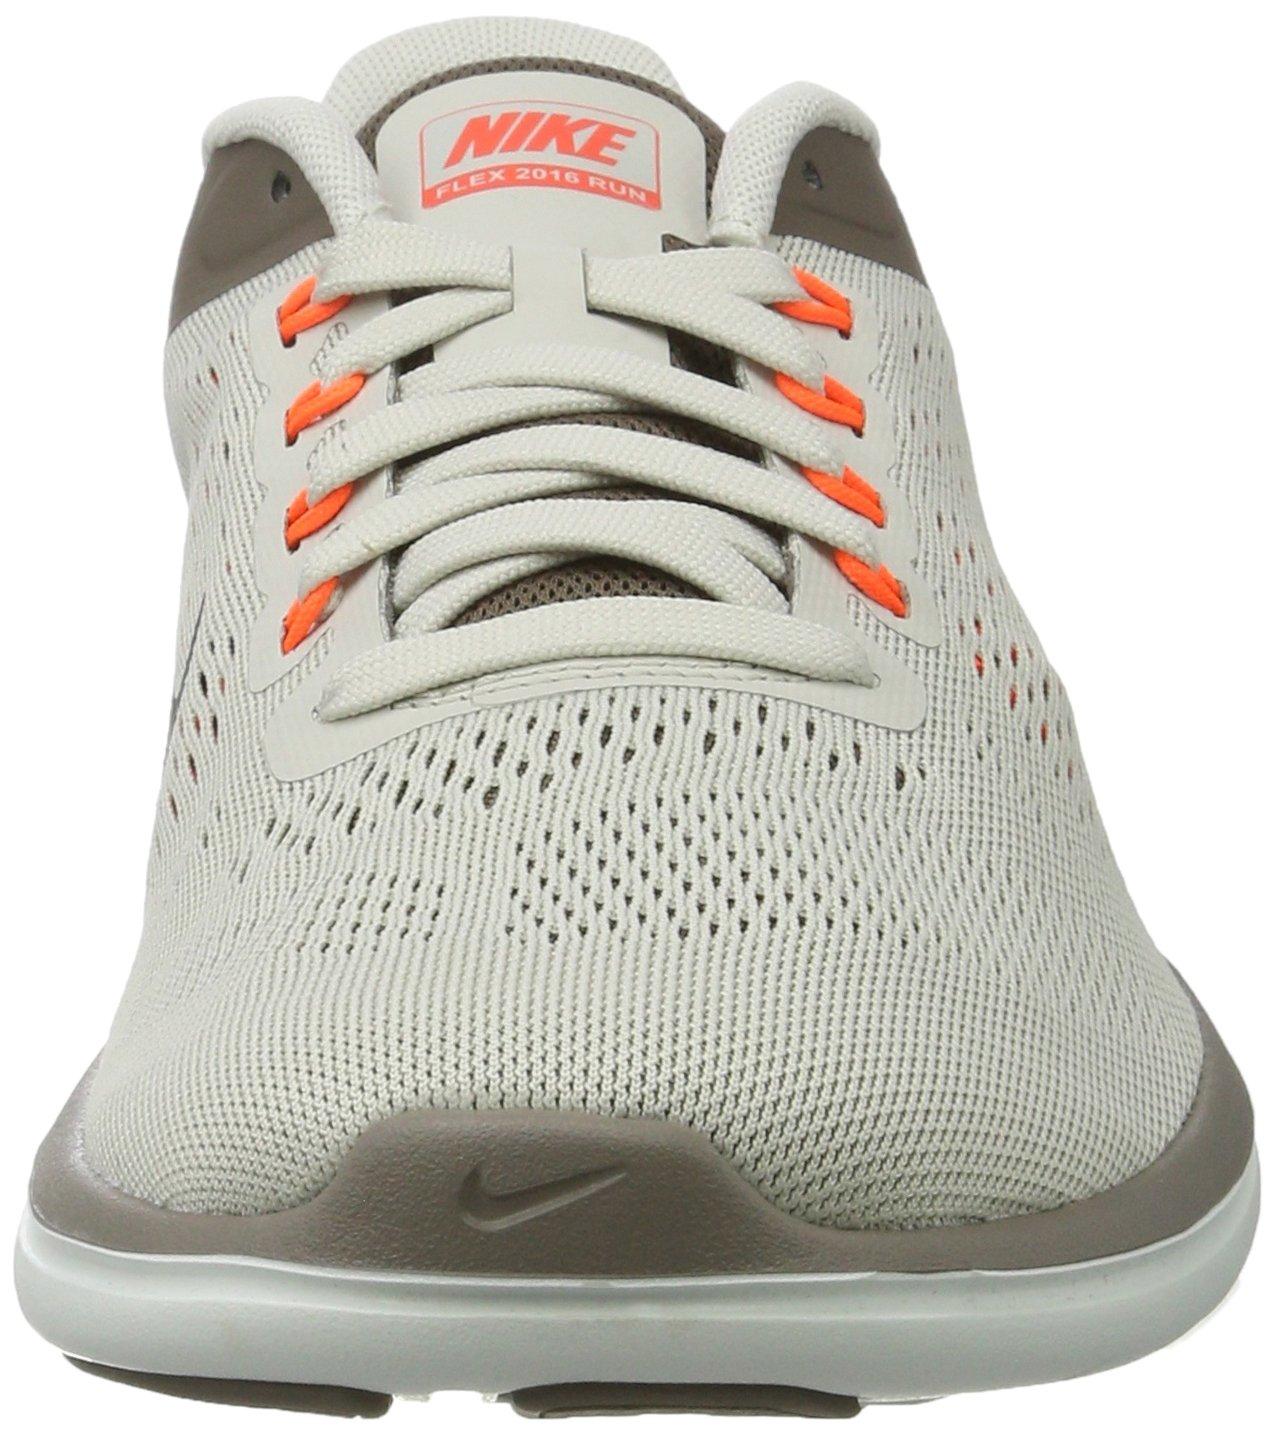 Nike Mens Flex 2016 RN Running Shoe Light Bone/Dark Mushroom/Hyper Orange/Black 8.5 D(M) US by NIKE (Image #4)